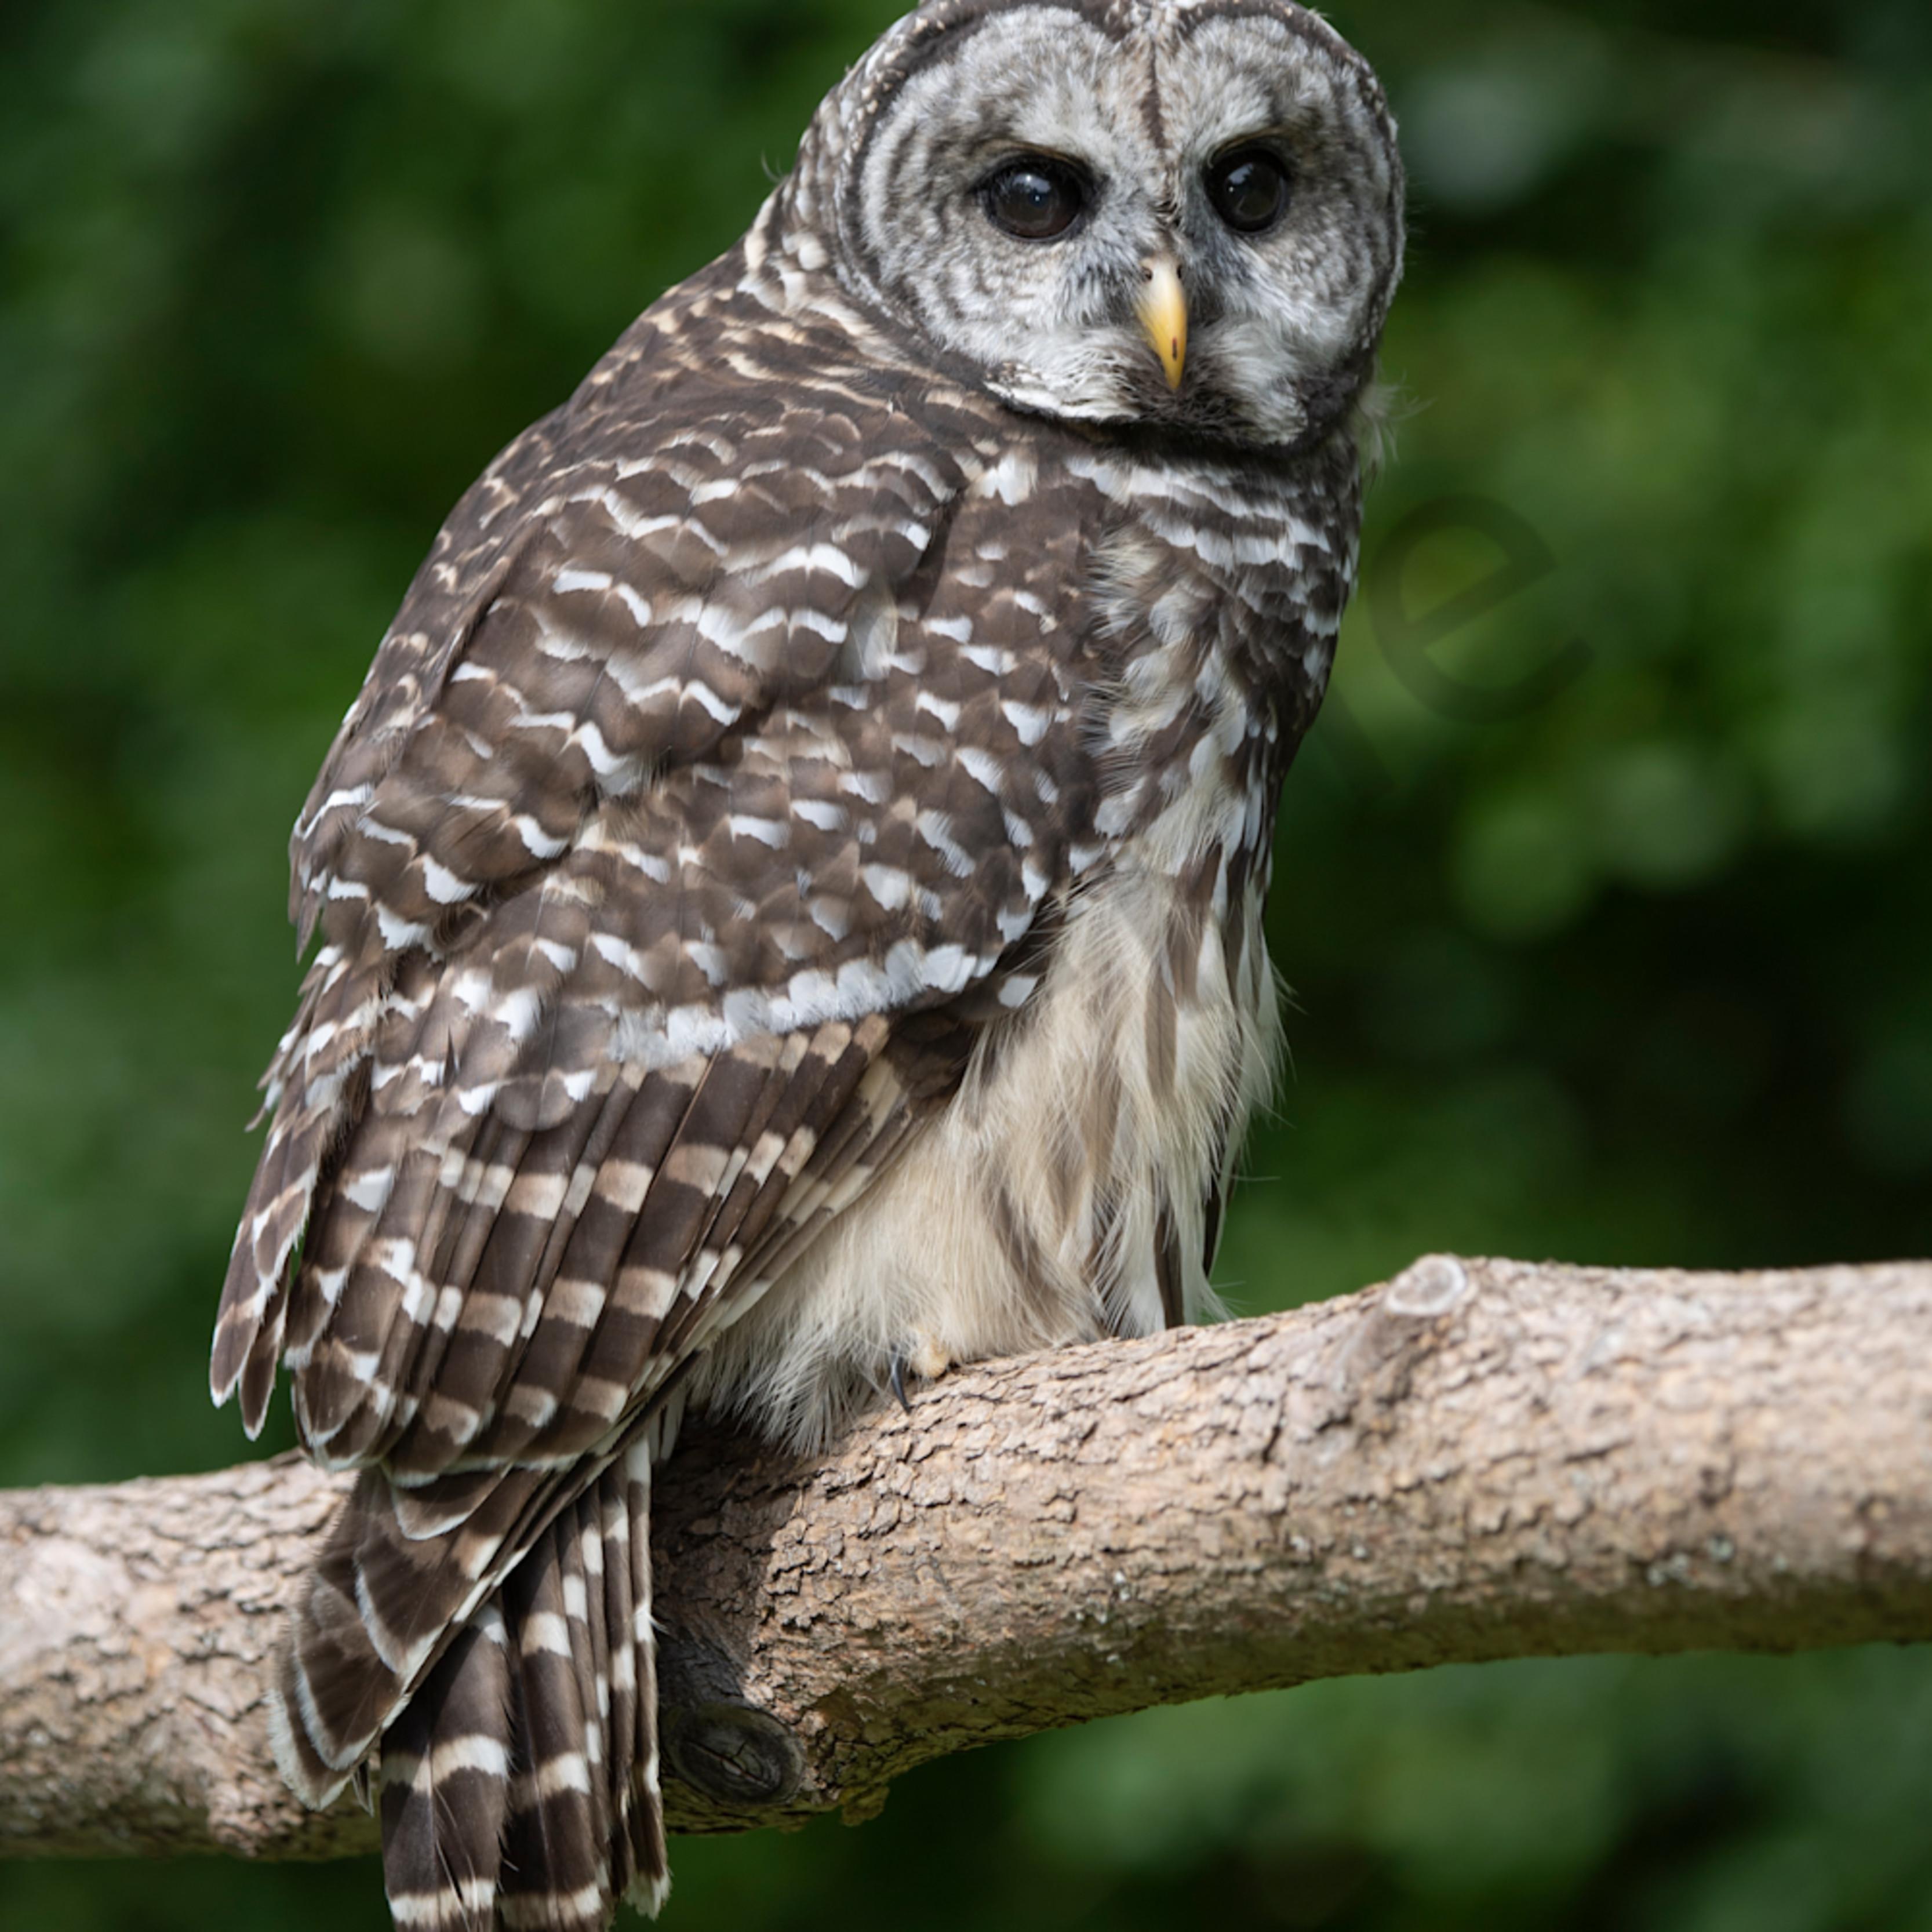 Barred owl peek al8rvk